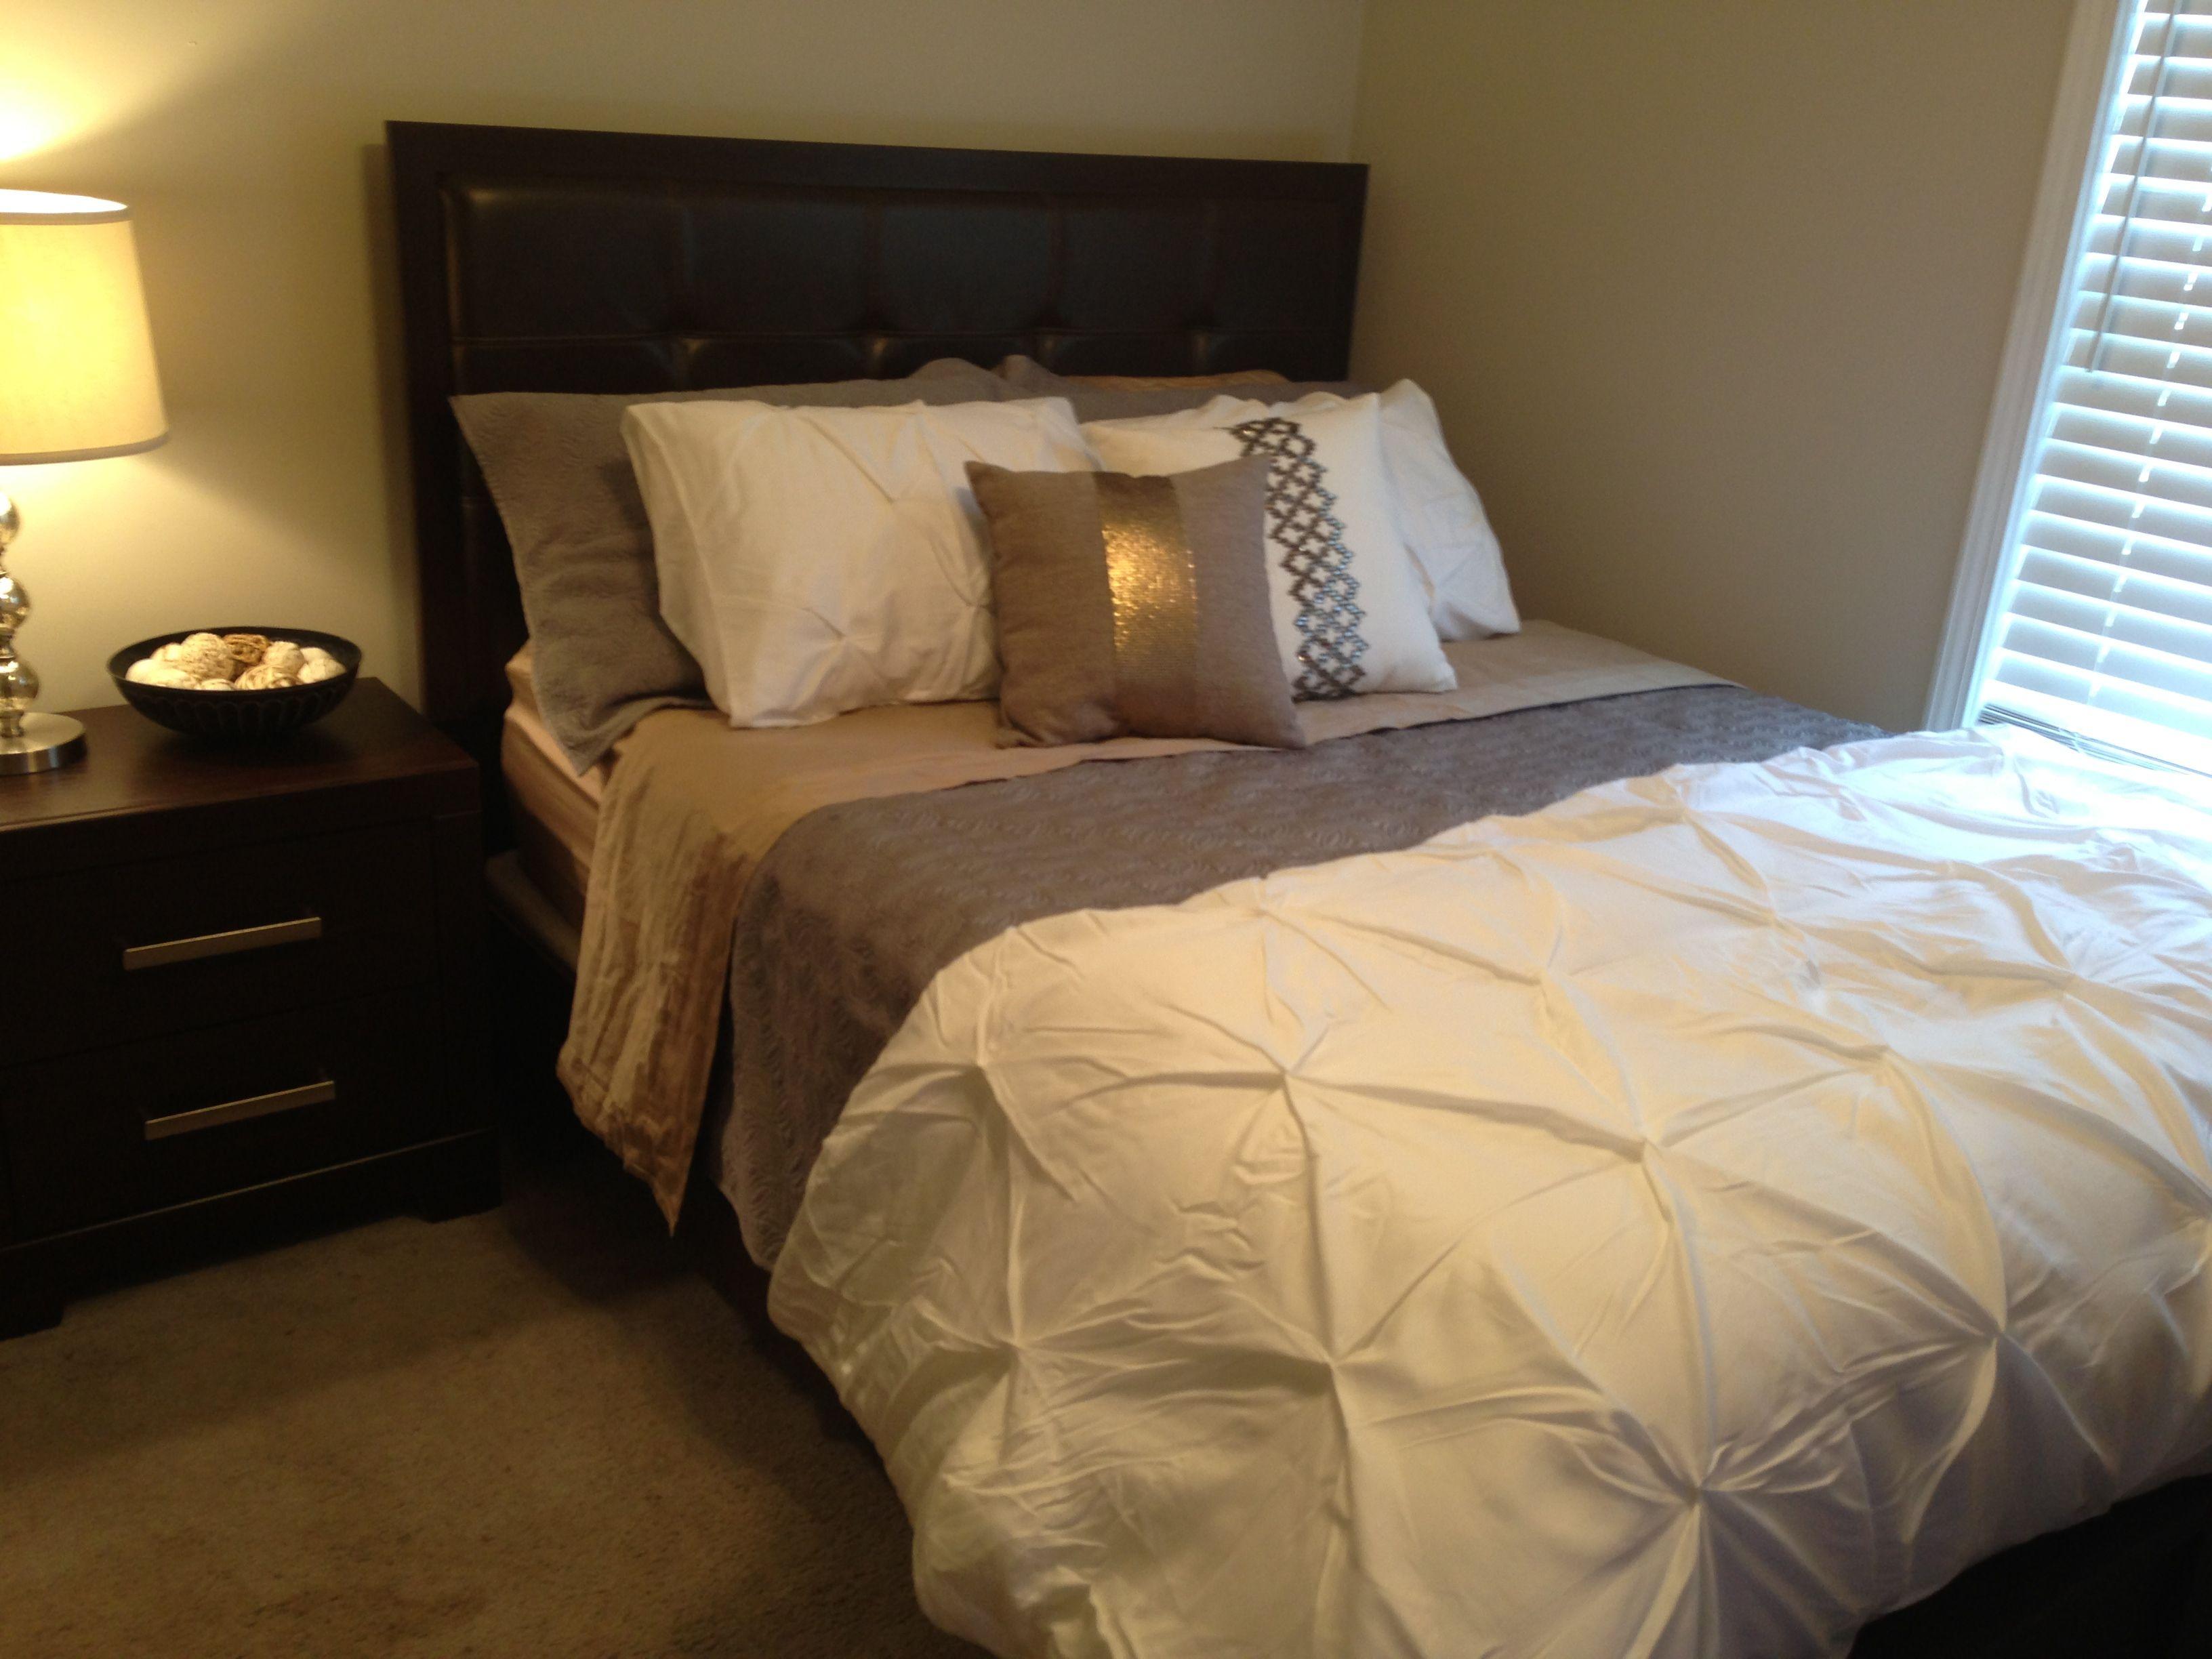 Target Bedroom Decor Nate Berkus Threshold Bedding Target Target Home Pinterest